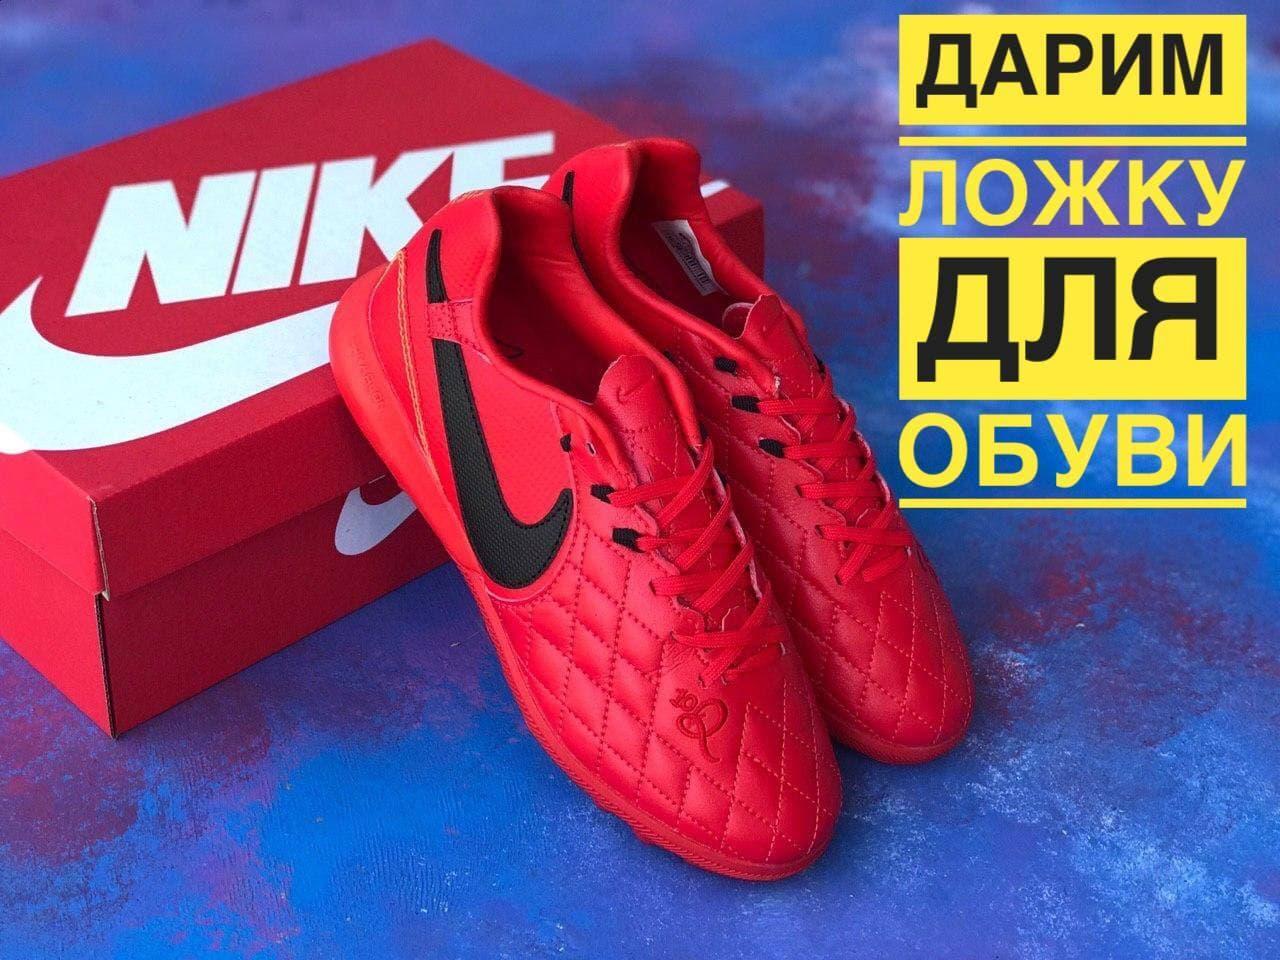 Сороконожки Nike Tiempo Ligera IV TF многошиповки найк темпо тиемпо бампы лигера рональдиньо многошиповки